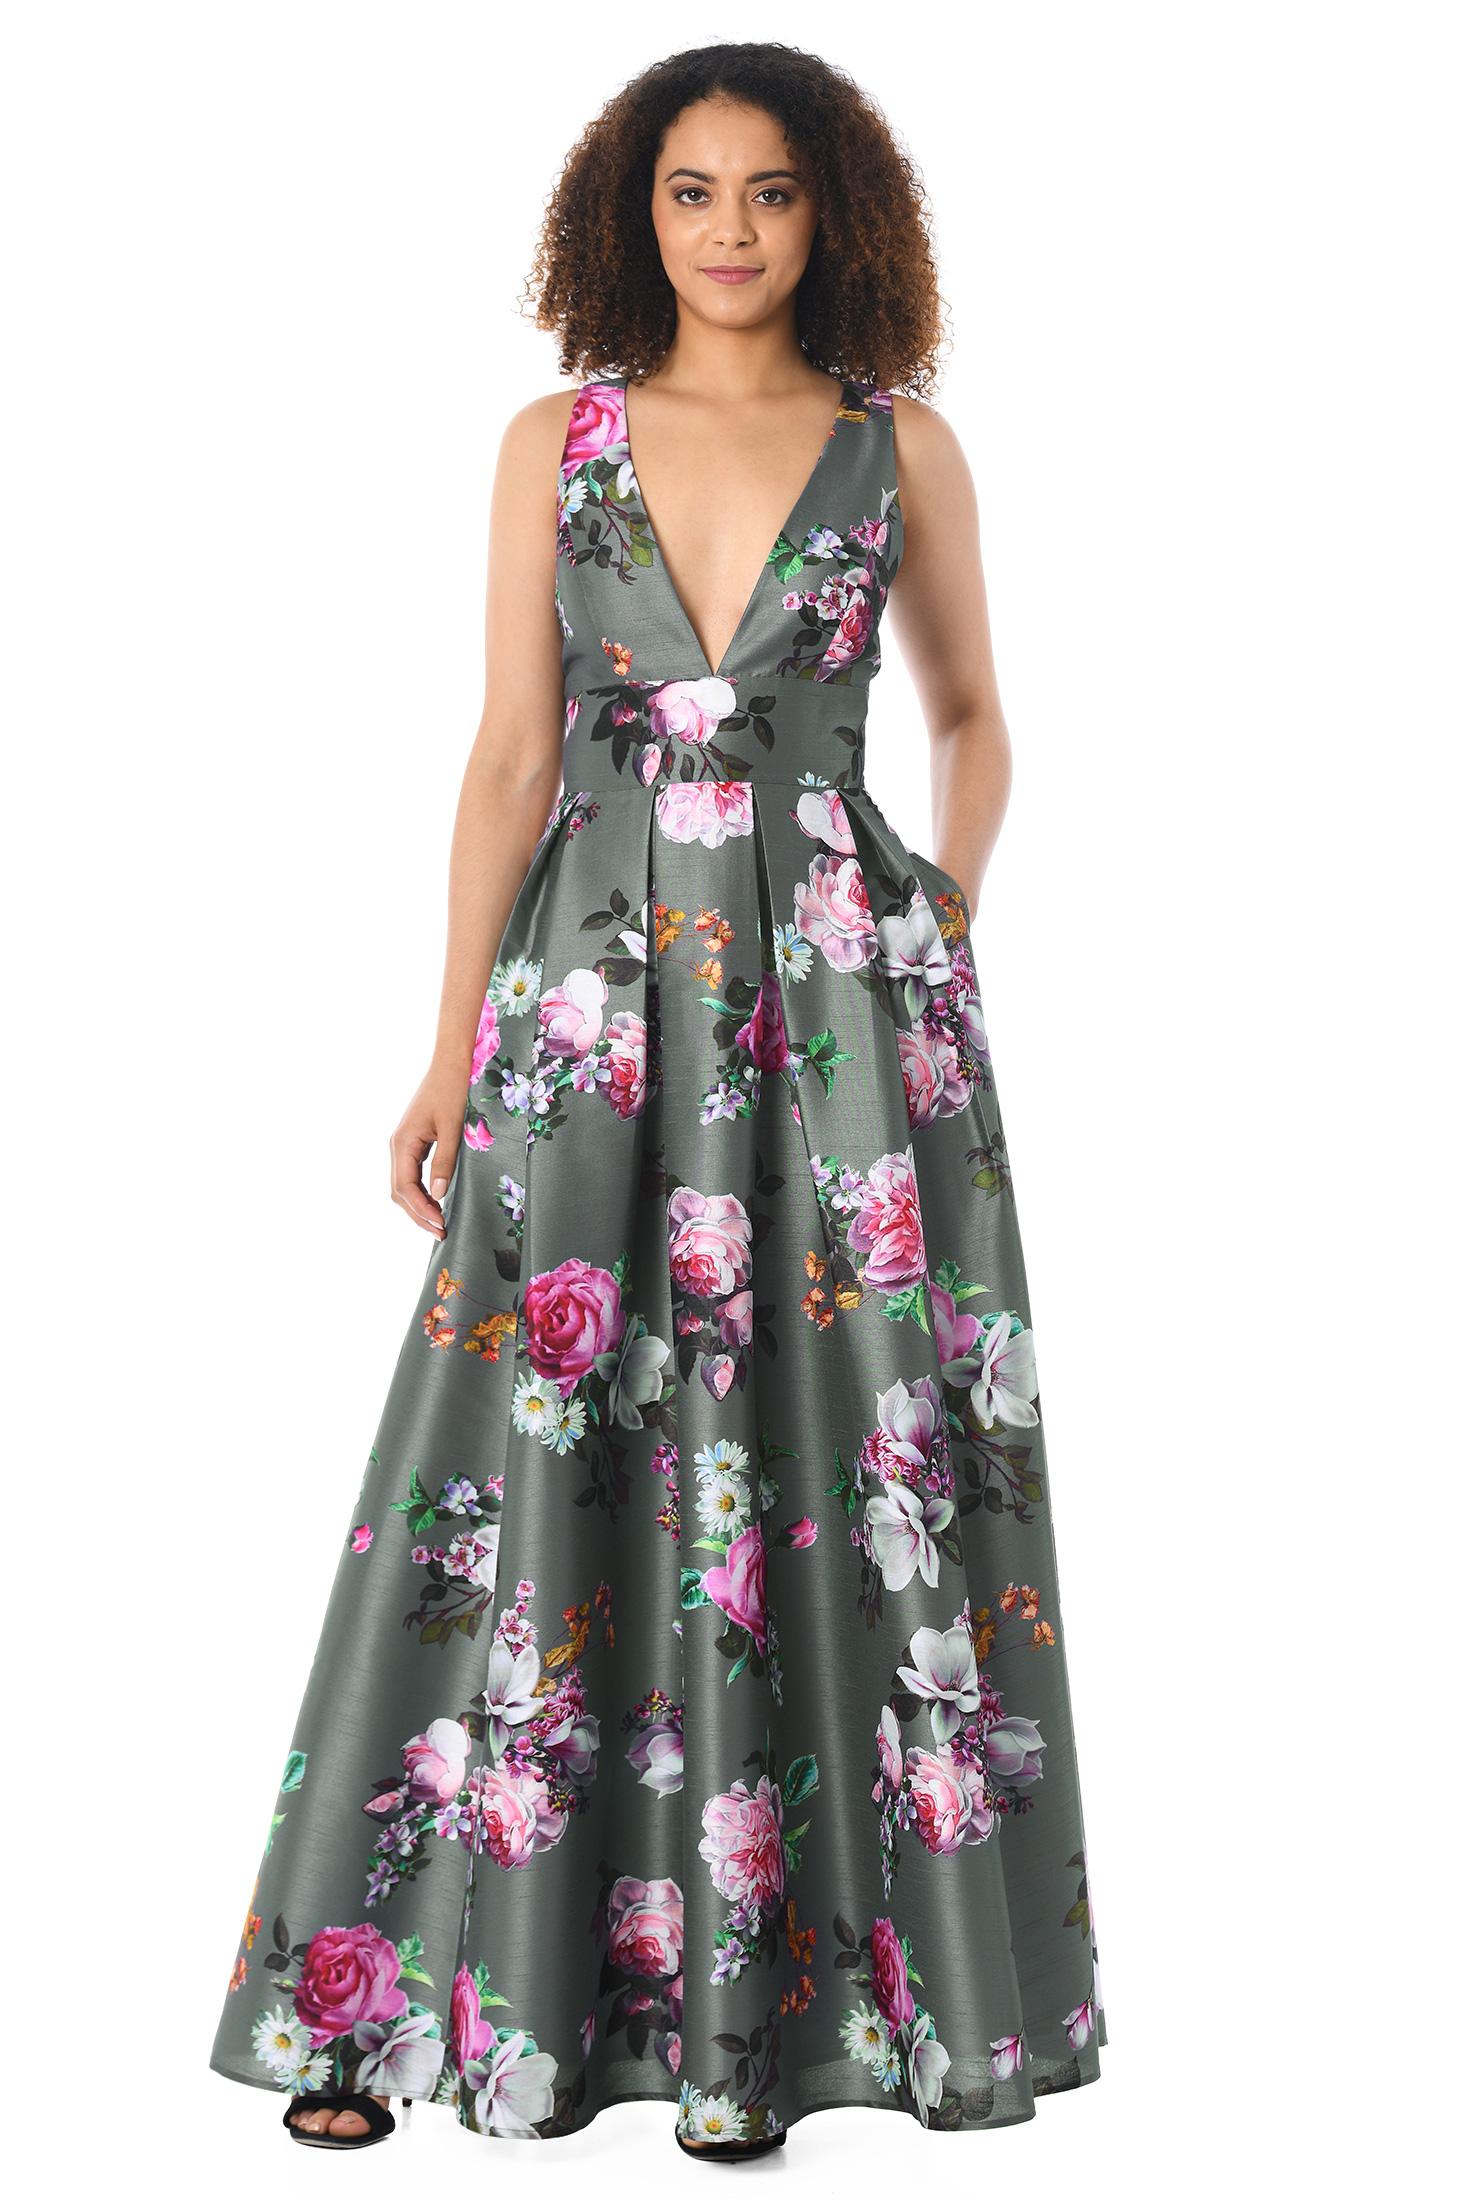 d4f5c6195a8 Women s Fashion Clothing 0-36W and Custom